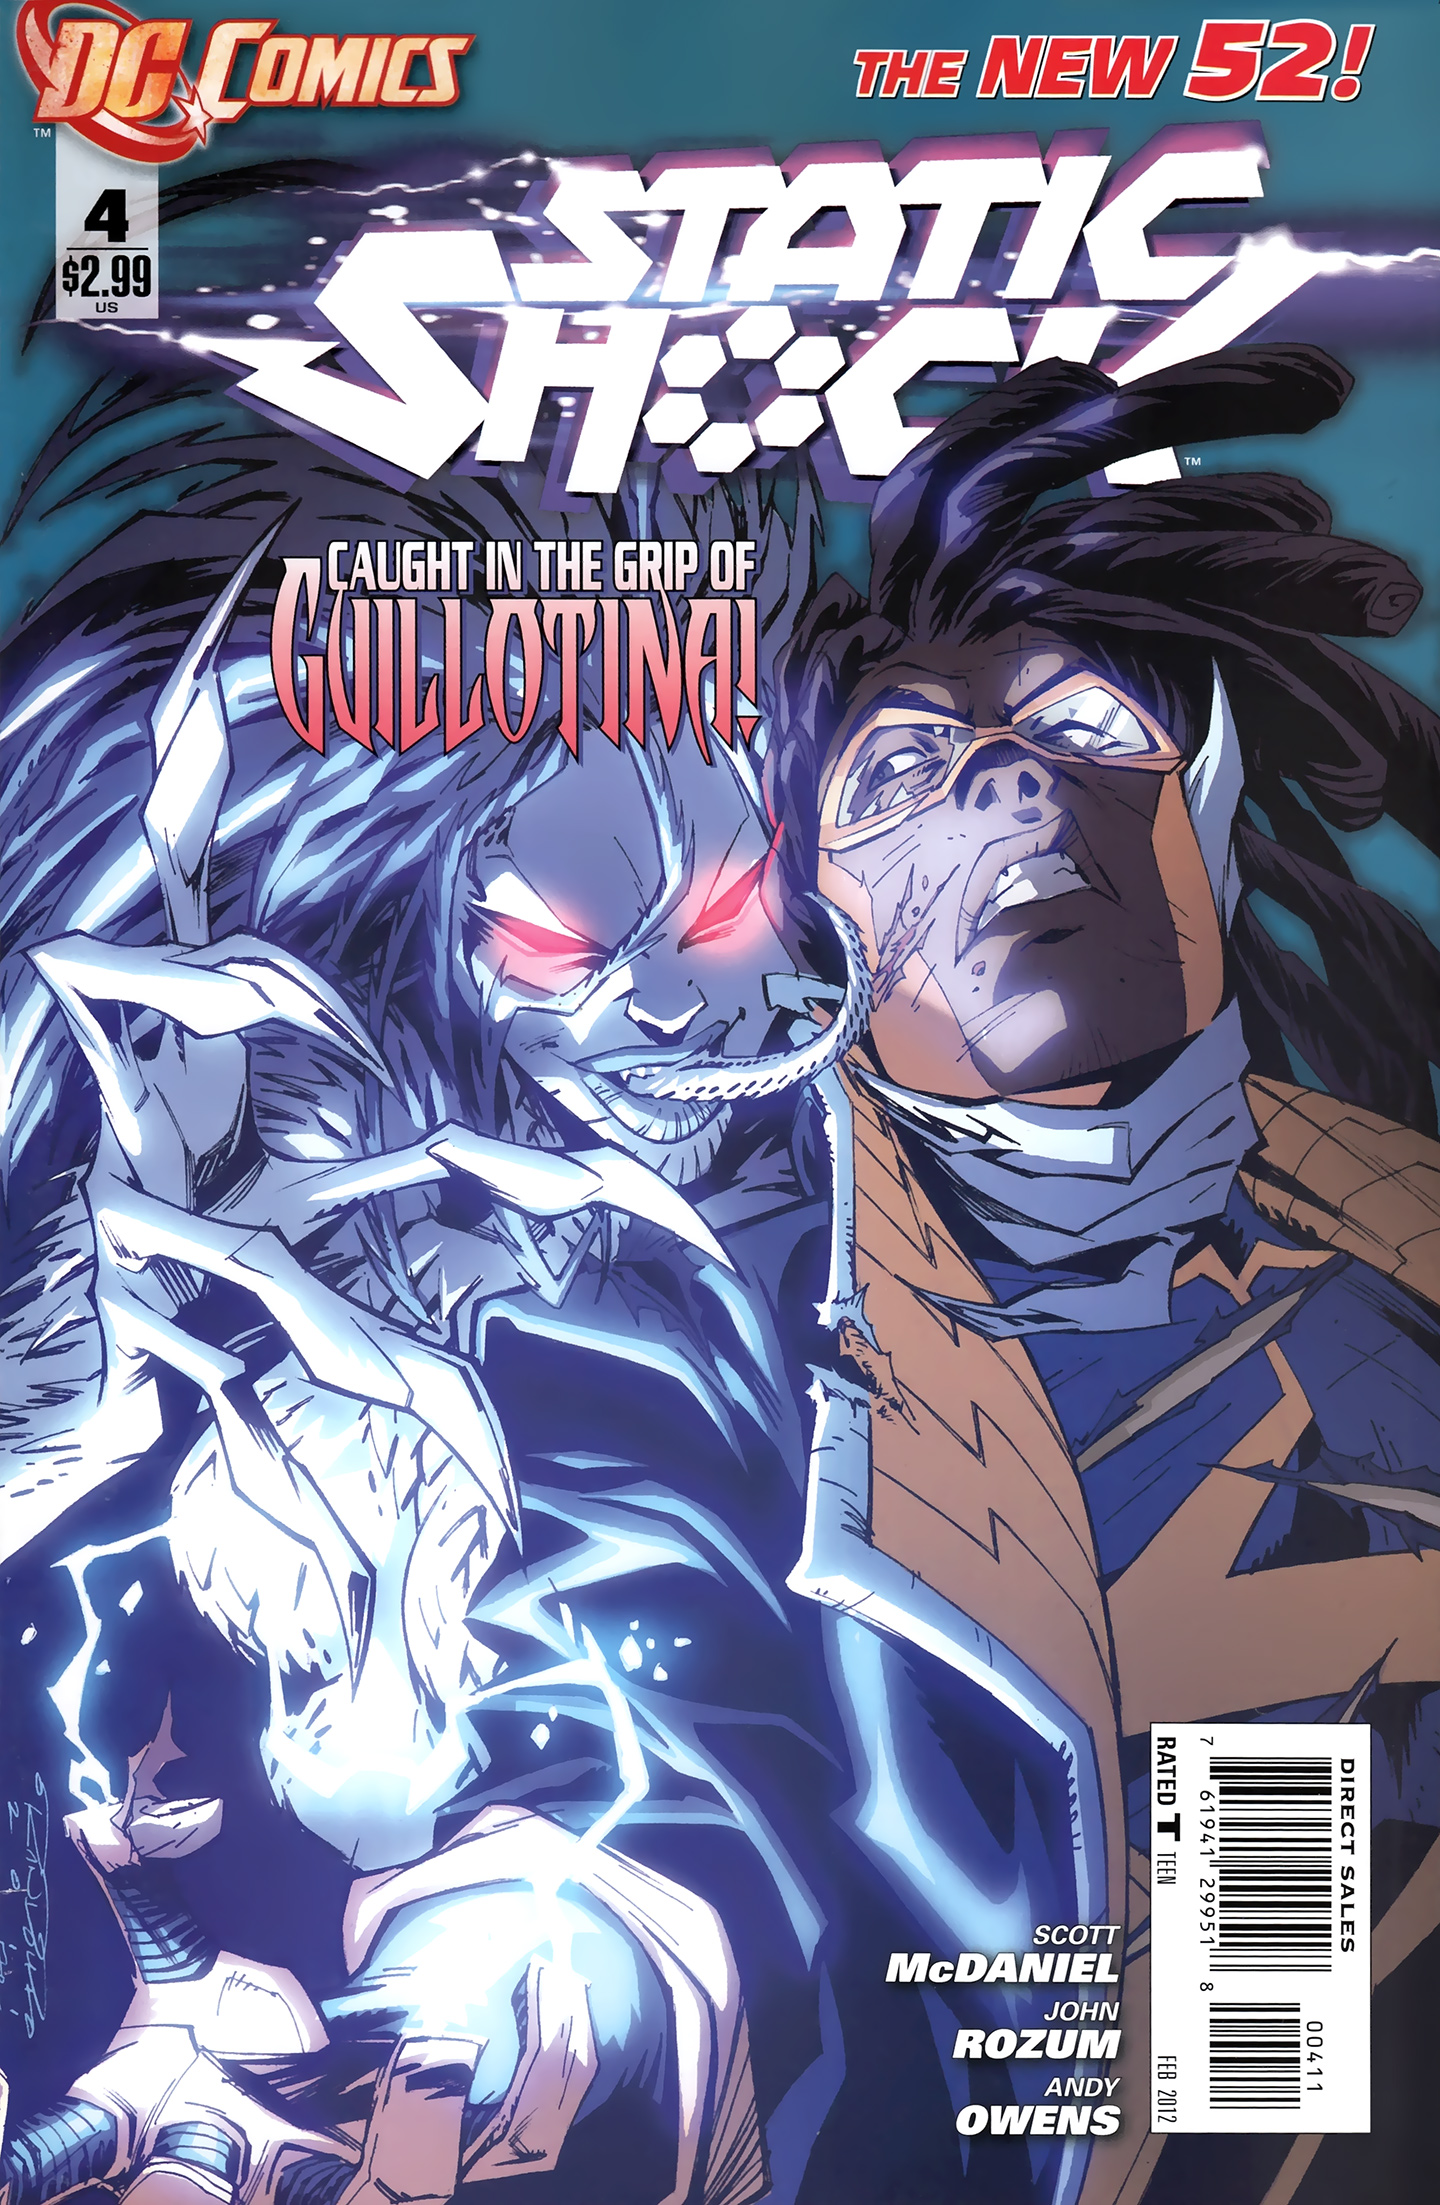 detective comics new 52 volume cbr